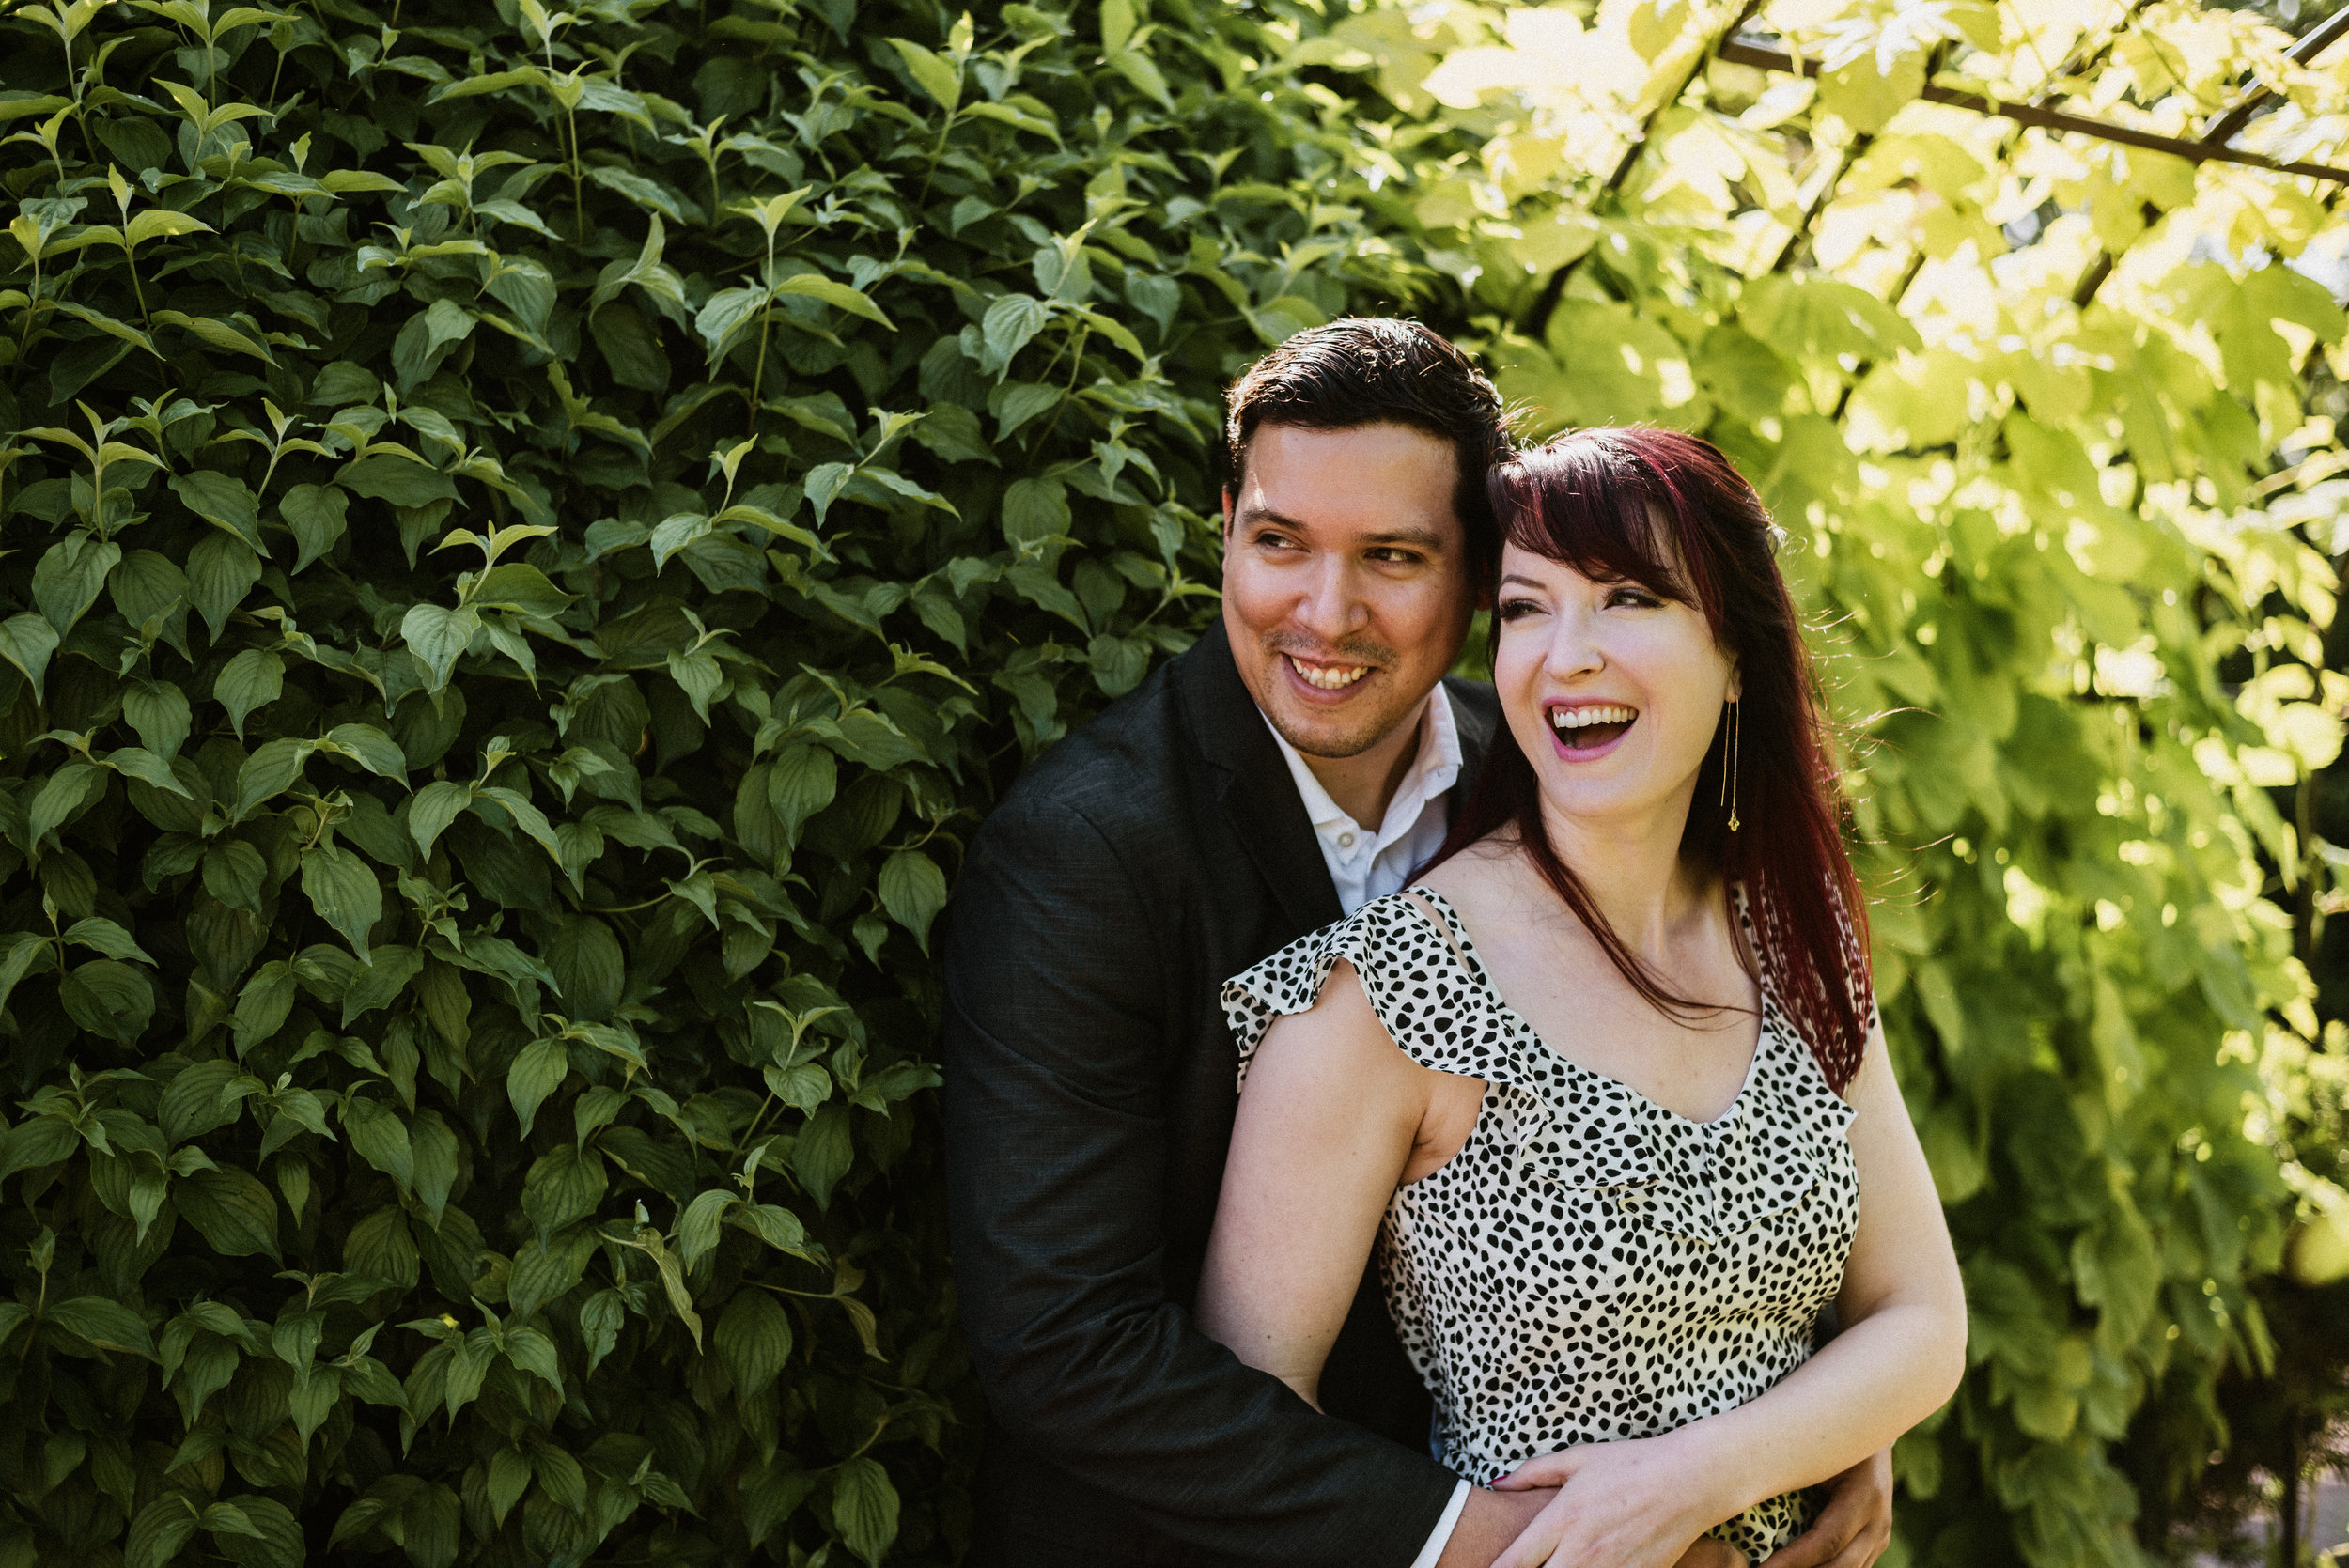 Sarah and Marcel - Chicago Botanic Garden Engagement Session | Glencoe, IL